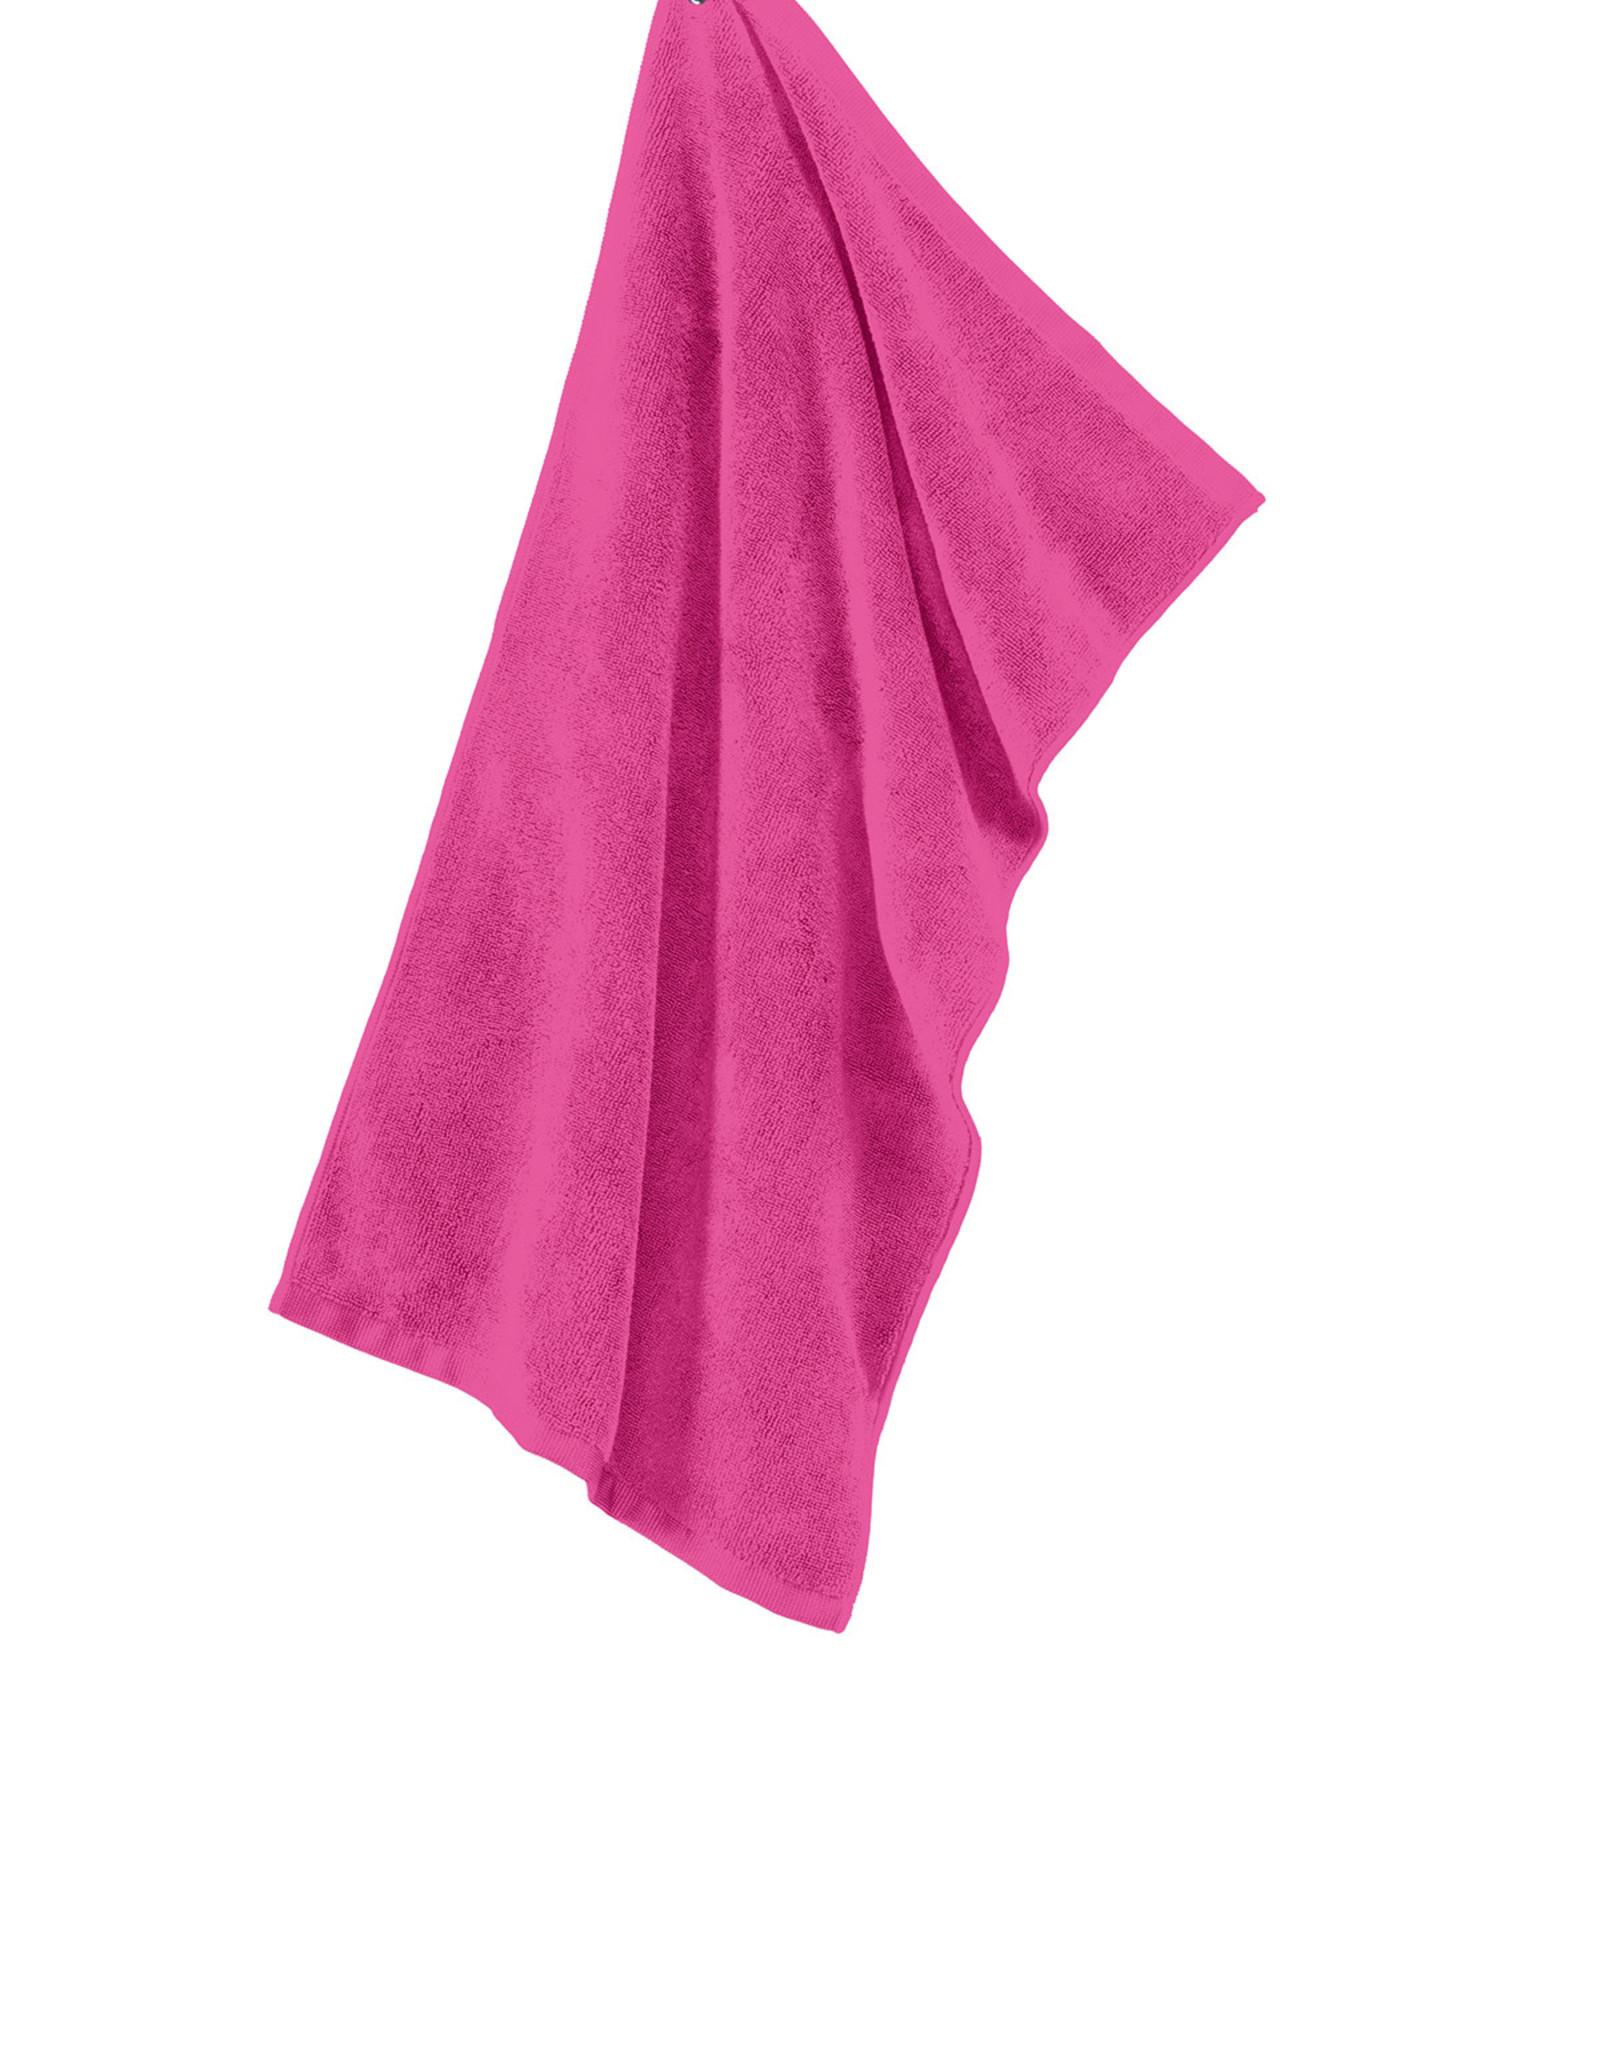 Port Authority Hot Pink Microfiber Golf Towel